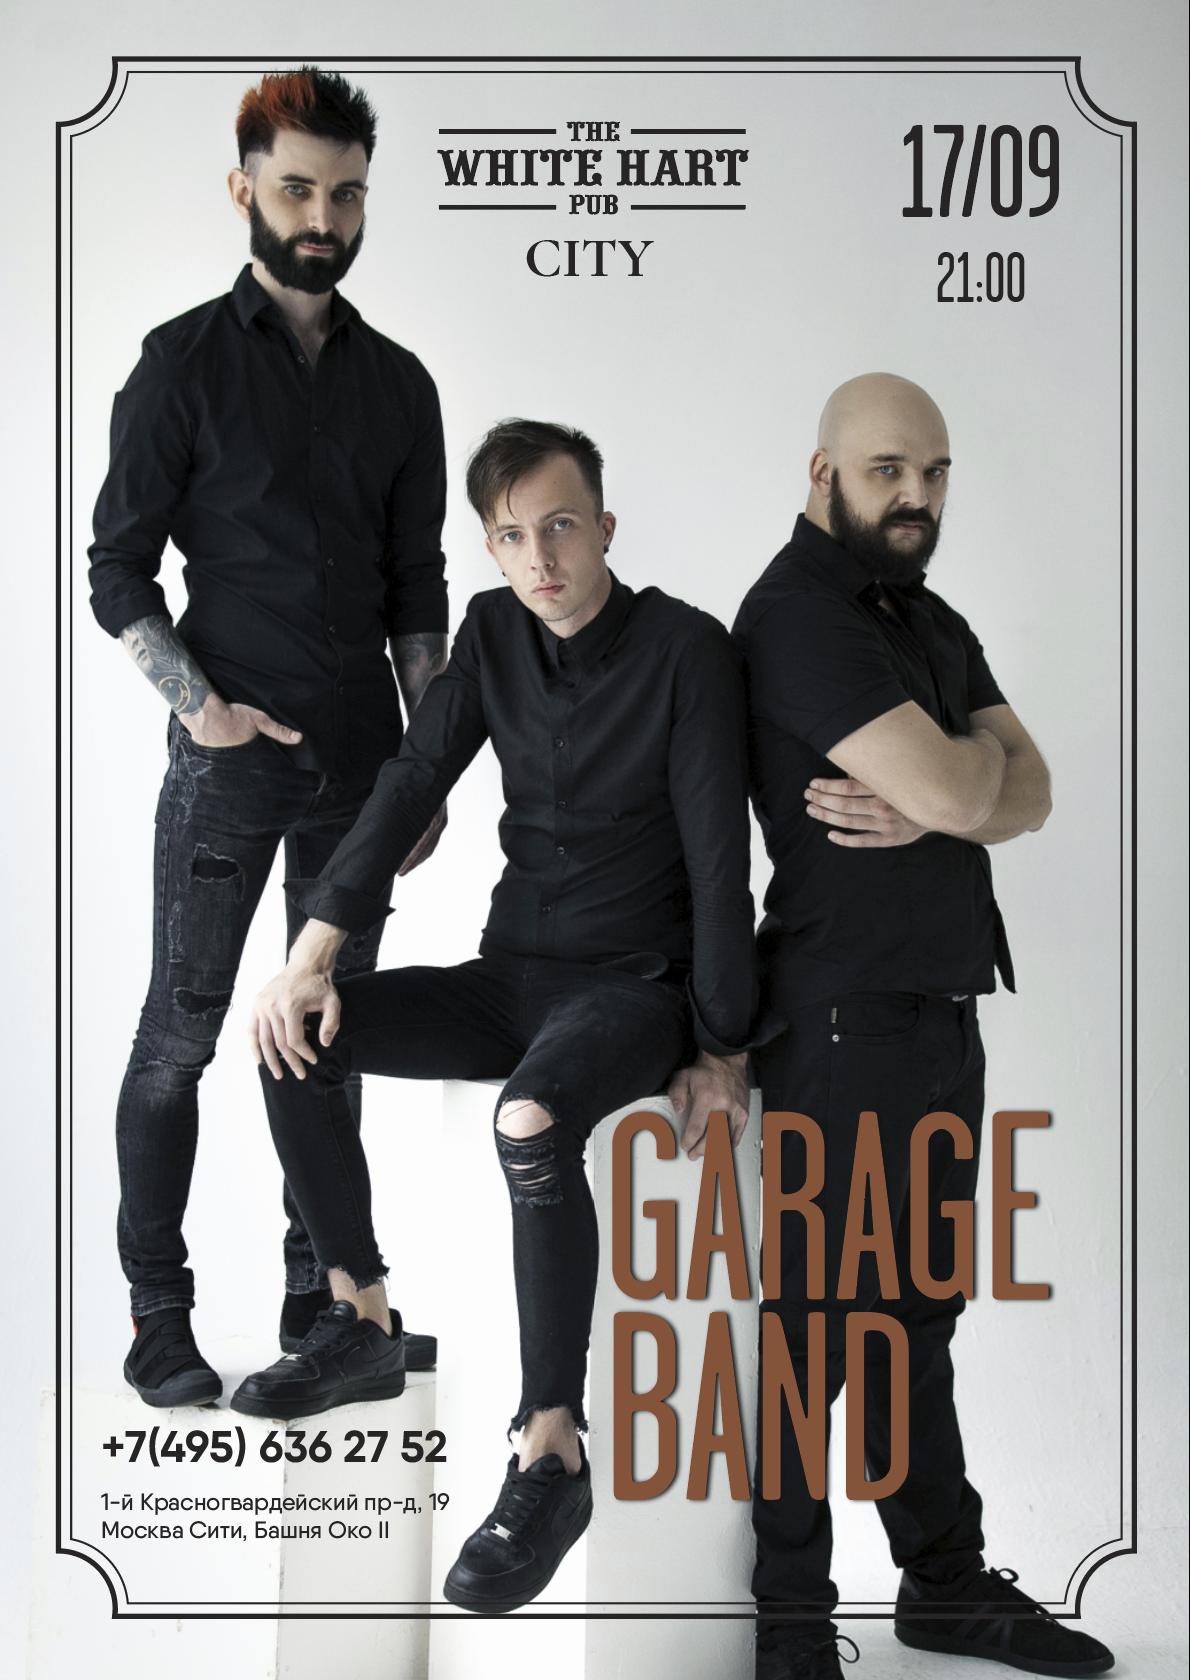 Афиша! 17 сентября — Кавер группа Garage Band  в White Hart Pub Moscow City